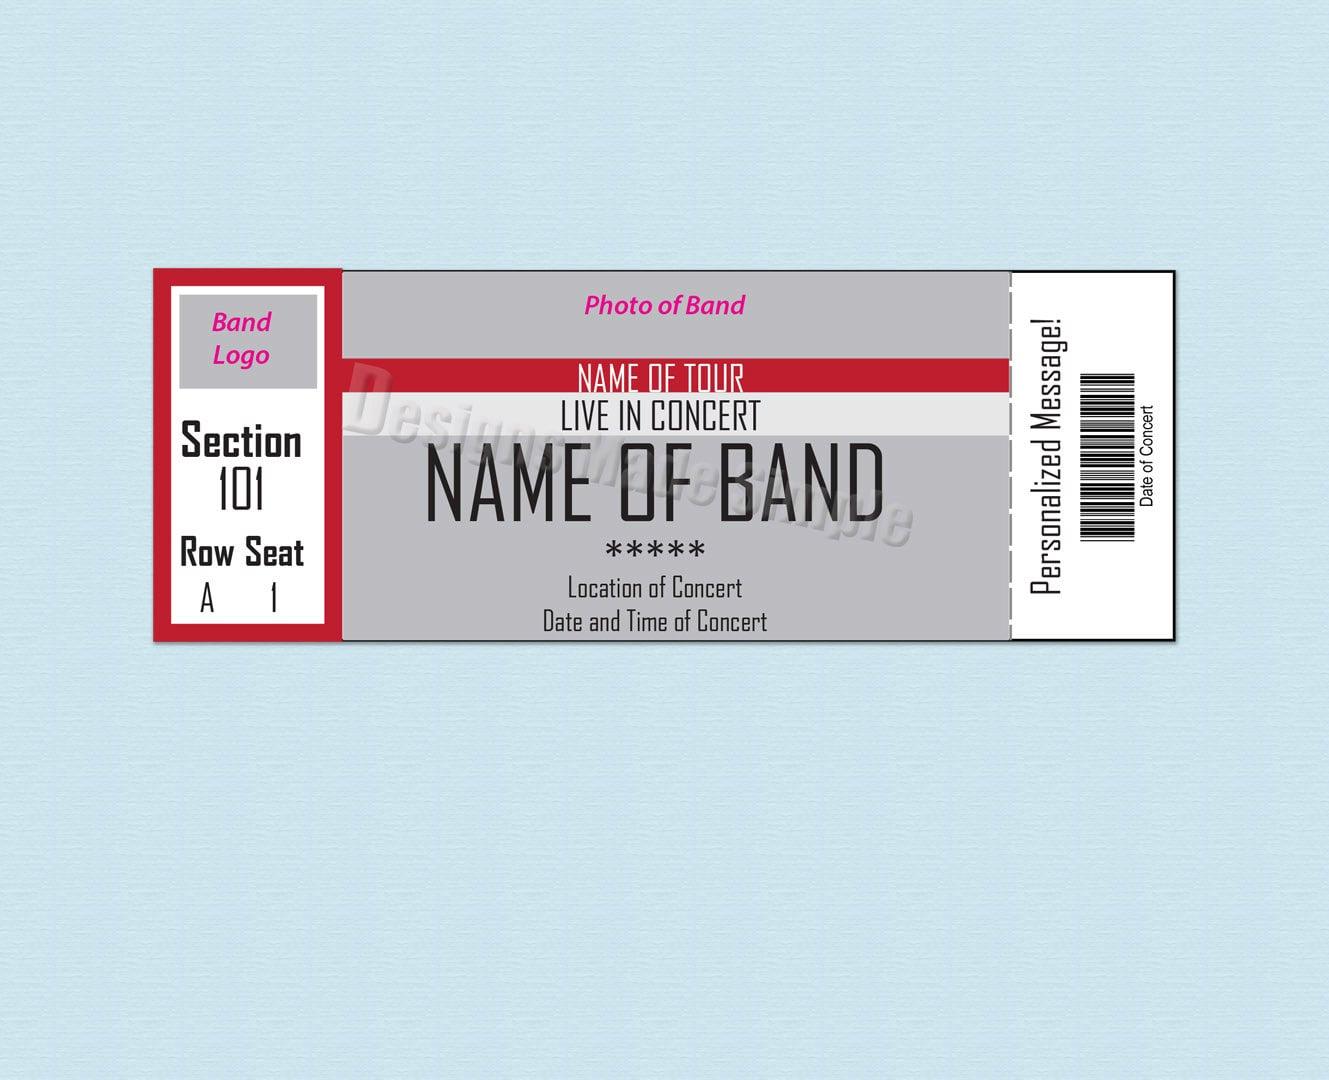 Concert ticket stub – Blank Concert Ticket Template